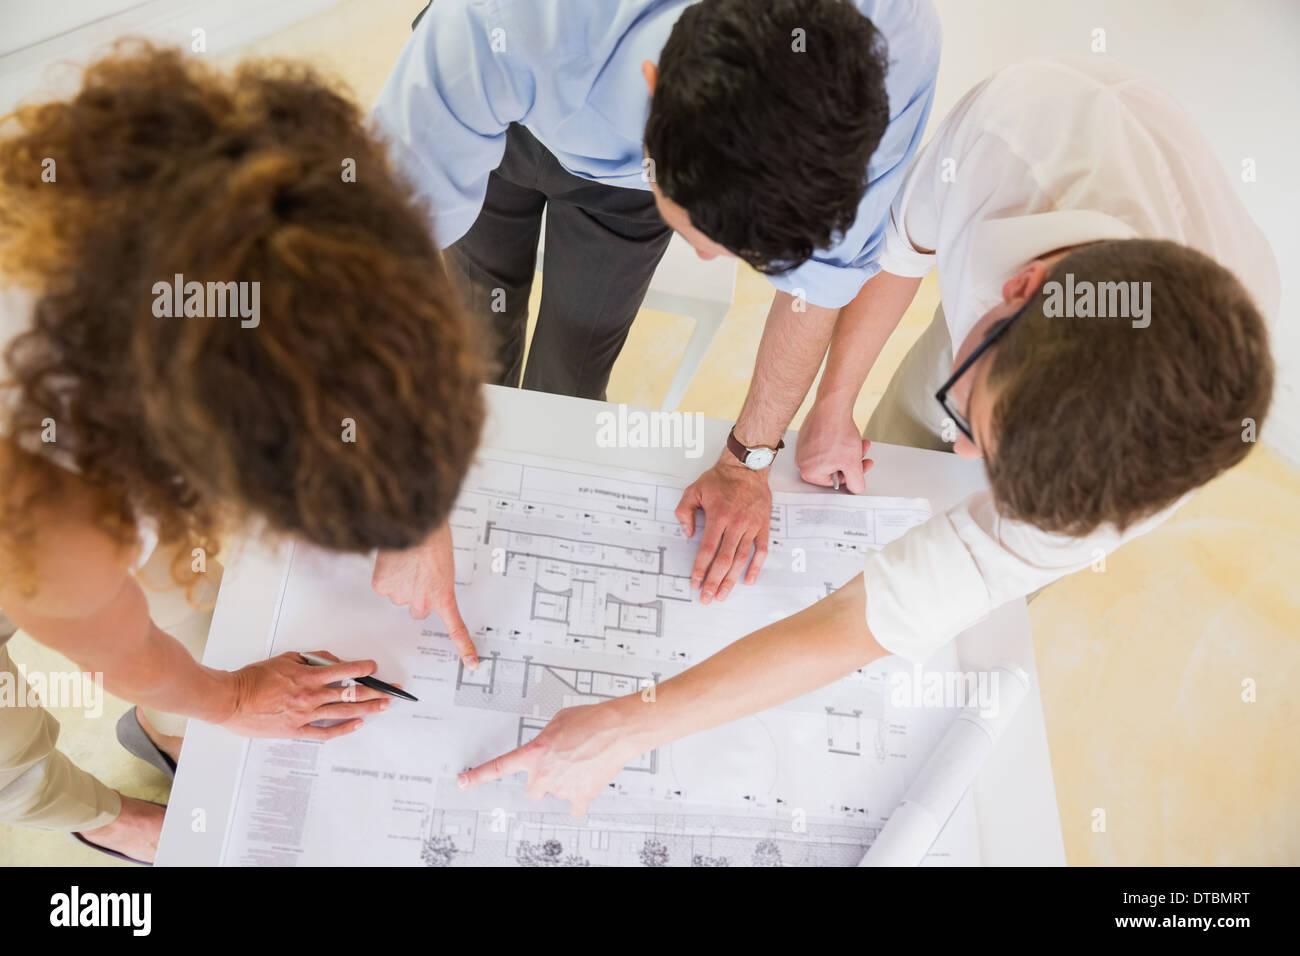 Business people analyzing blueprint - Stock Image